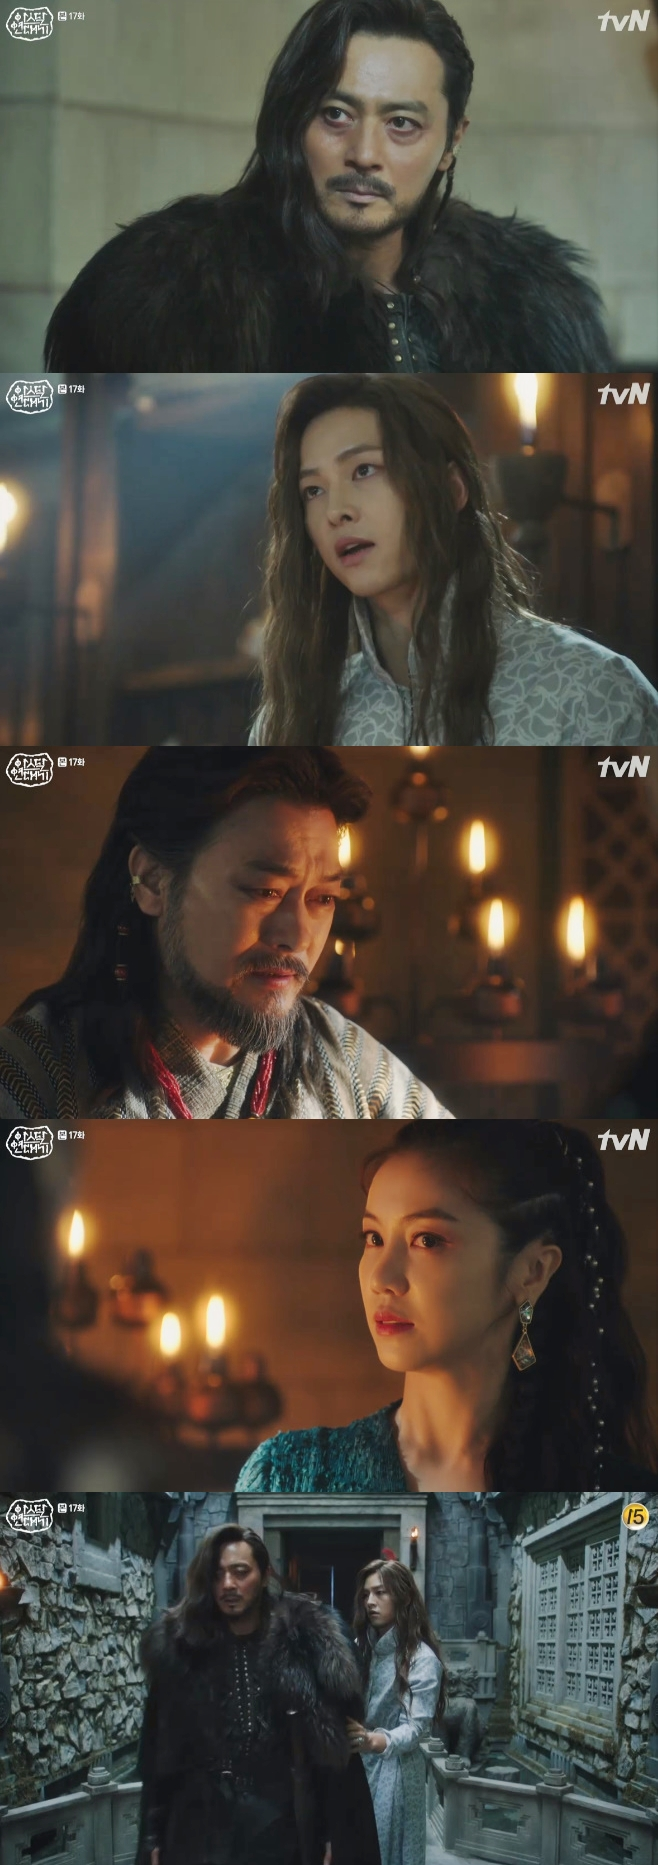 tvN 아스달 연대기, 장동건 송중기